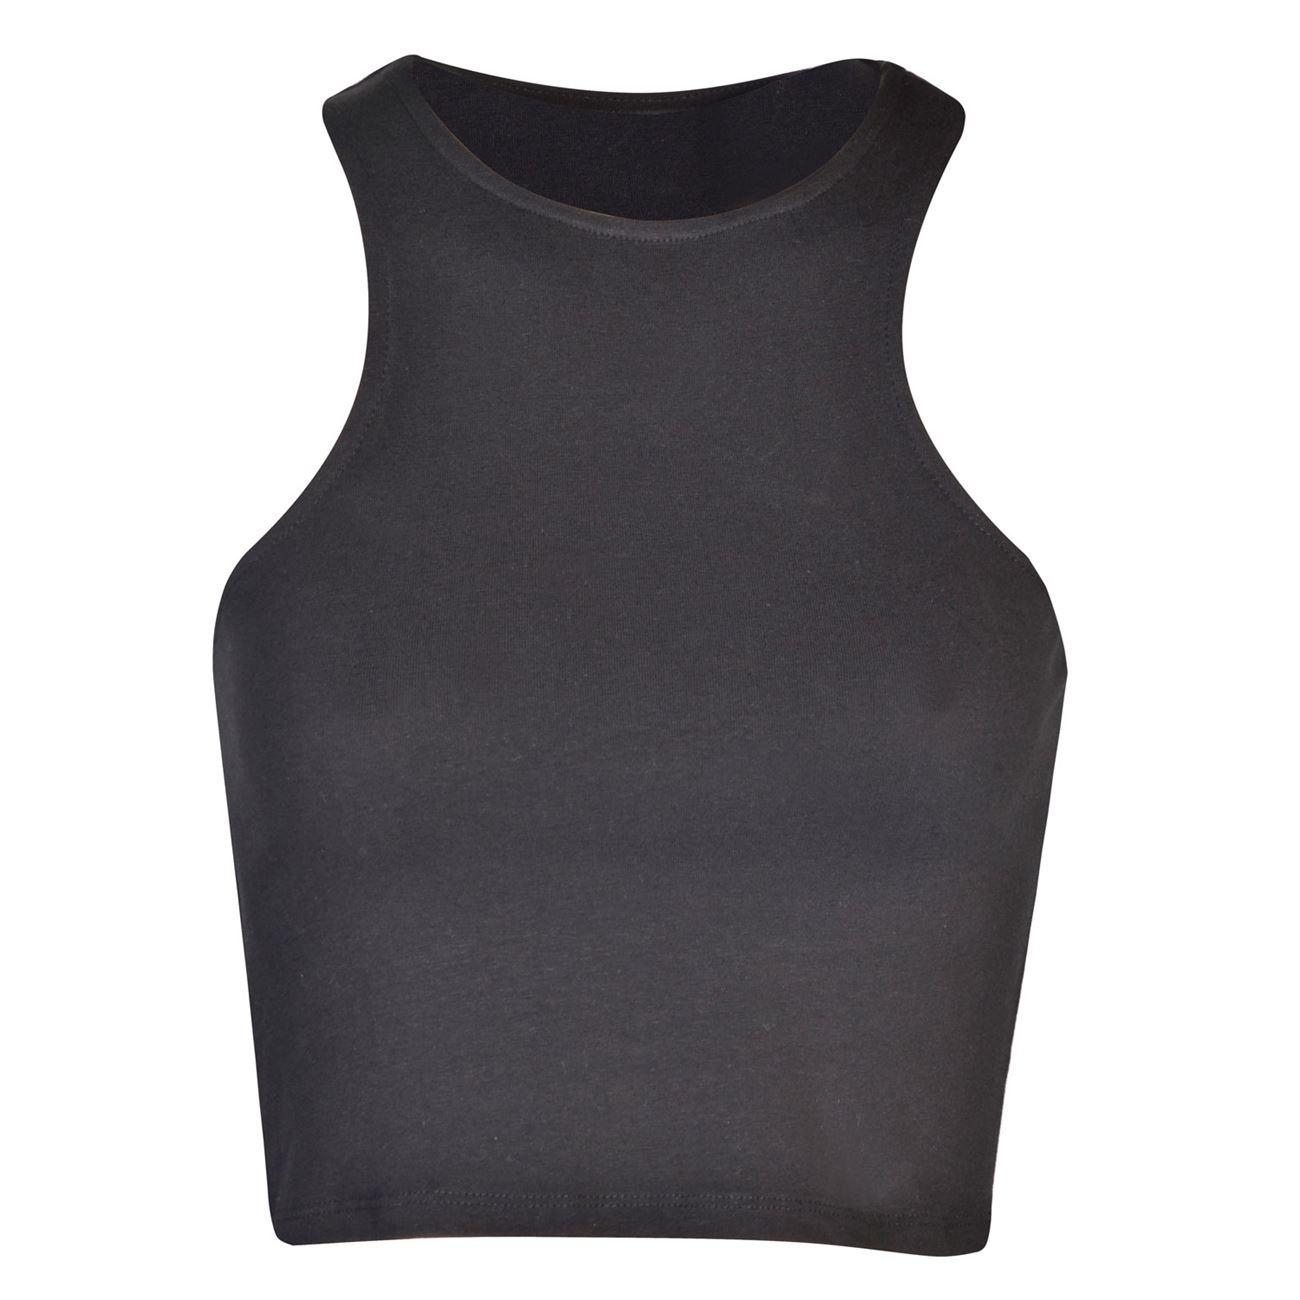 723b6ac9c6f Crop Top Γυναικείο Αμάνικο Μαύρο < Μπλούζες Χωρίς Μανίκι Crop Top ...